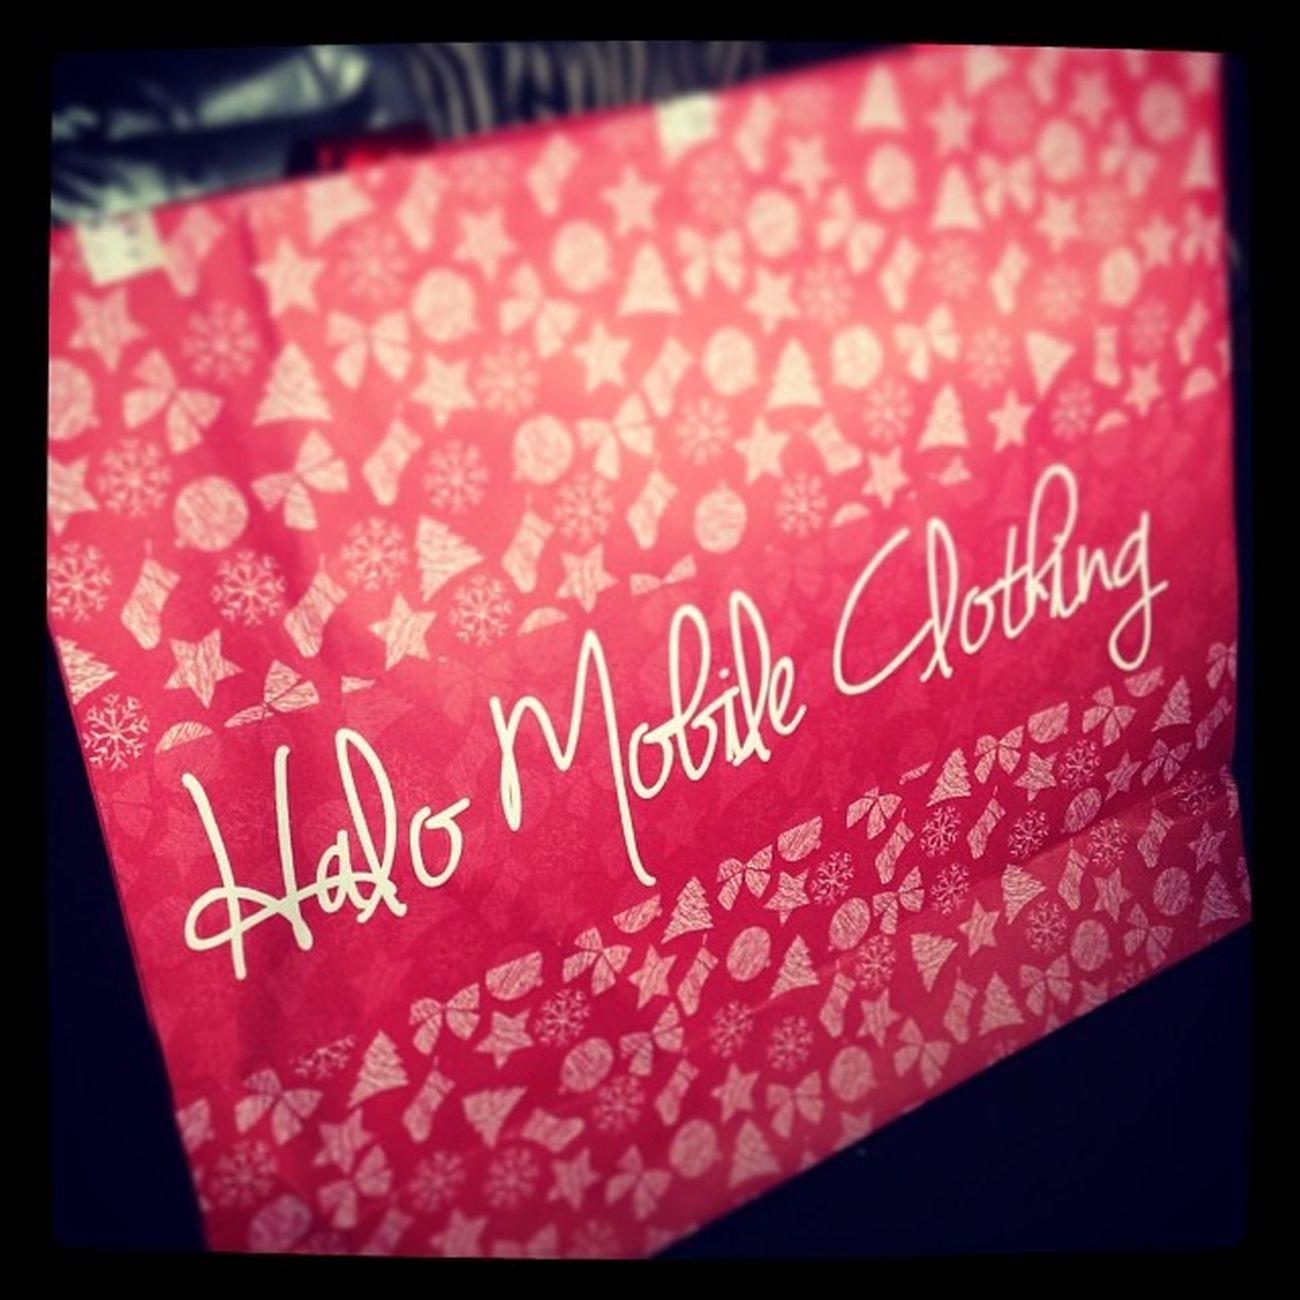 Im sure excited na yung bibigyan ko neto mamaya pag nakita niya toh mehehee ! Halomobileclothing Gift